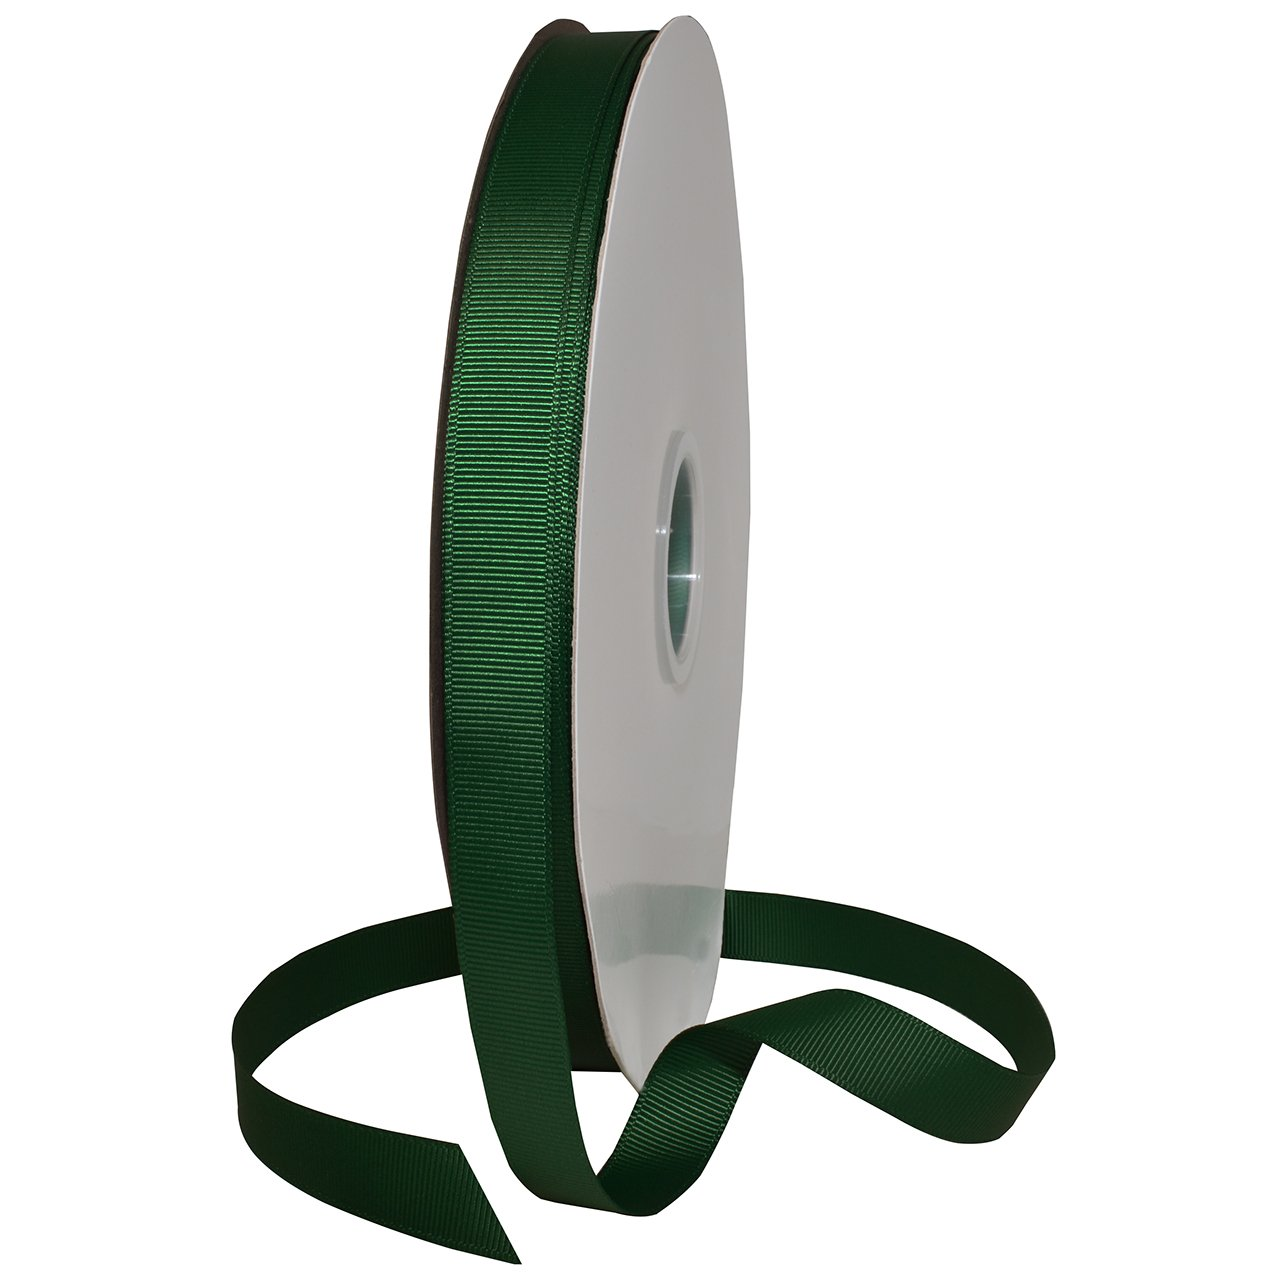 Morex Ribbon 06616/00-587 グログラン生地リボン、5/8インチ/16mm/100ヤード、フォレストグリーン   B075NLFXLV